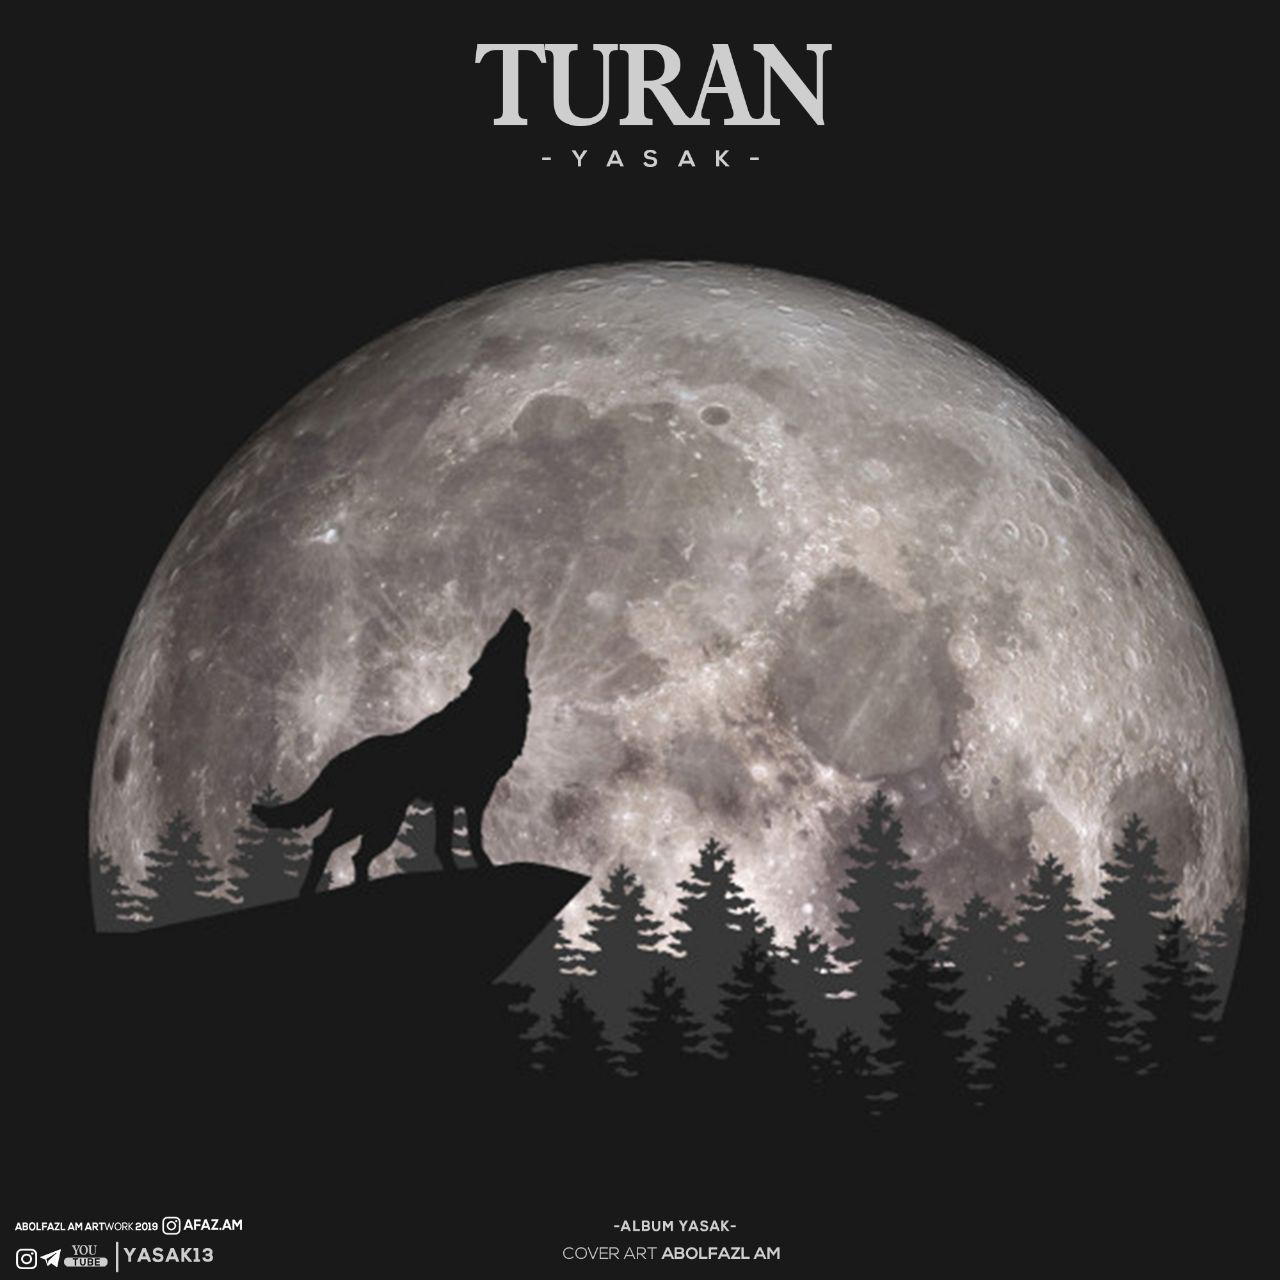 http://s8.picofile.com/file/8355217618/19Yasak_Turan.jpg